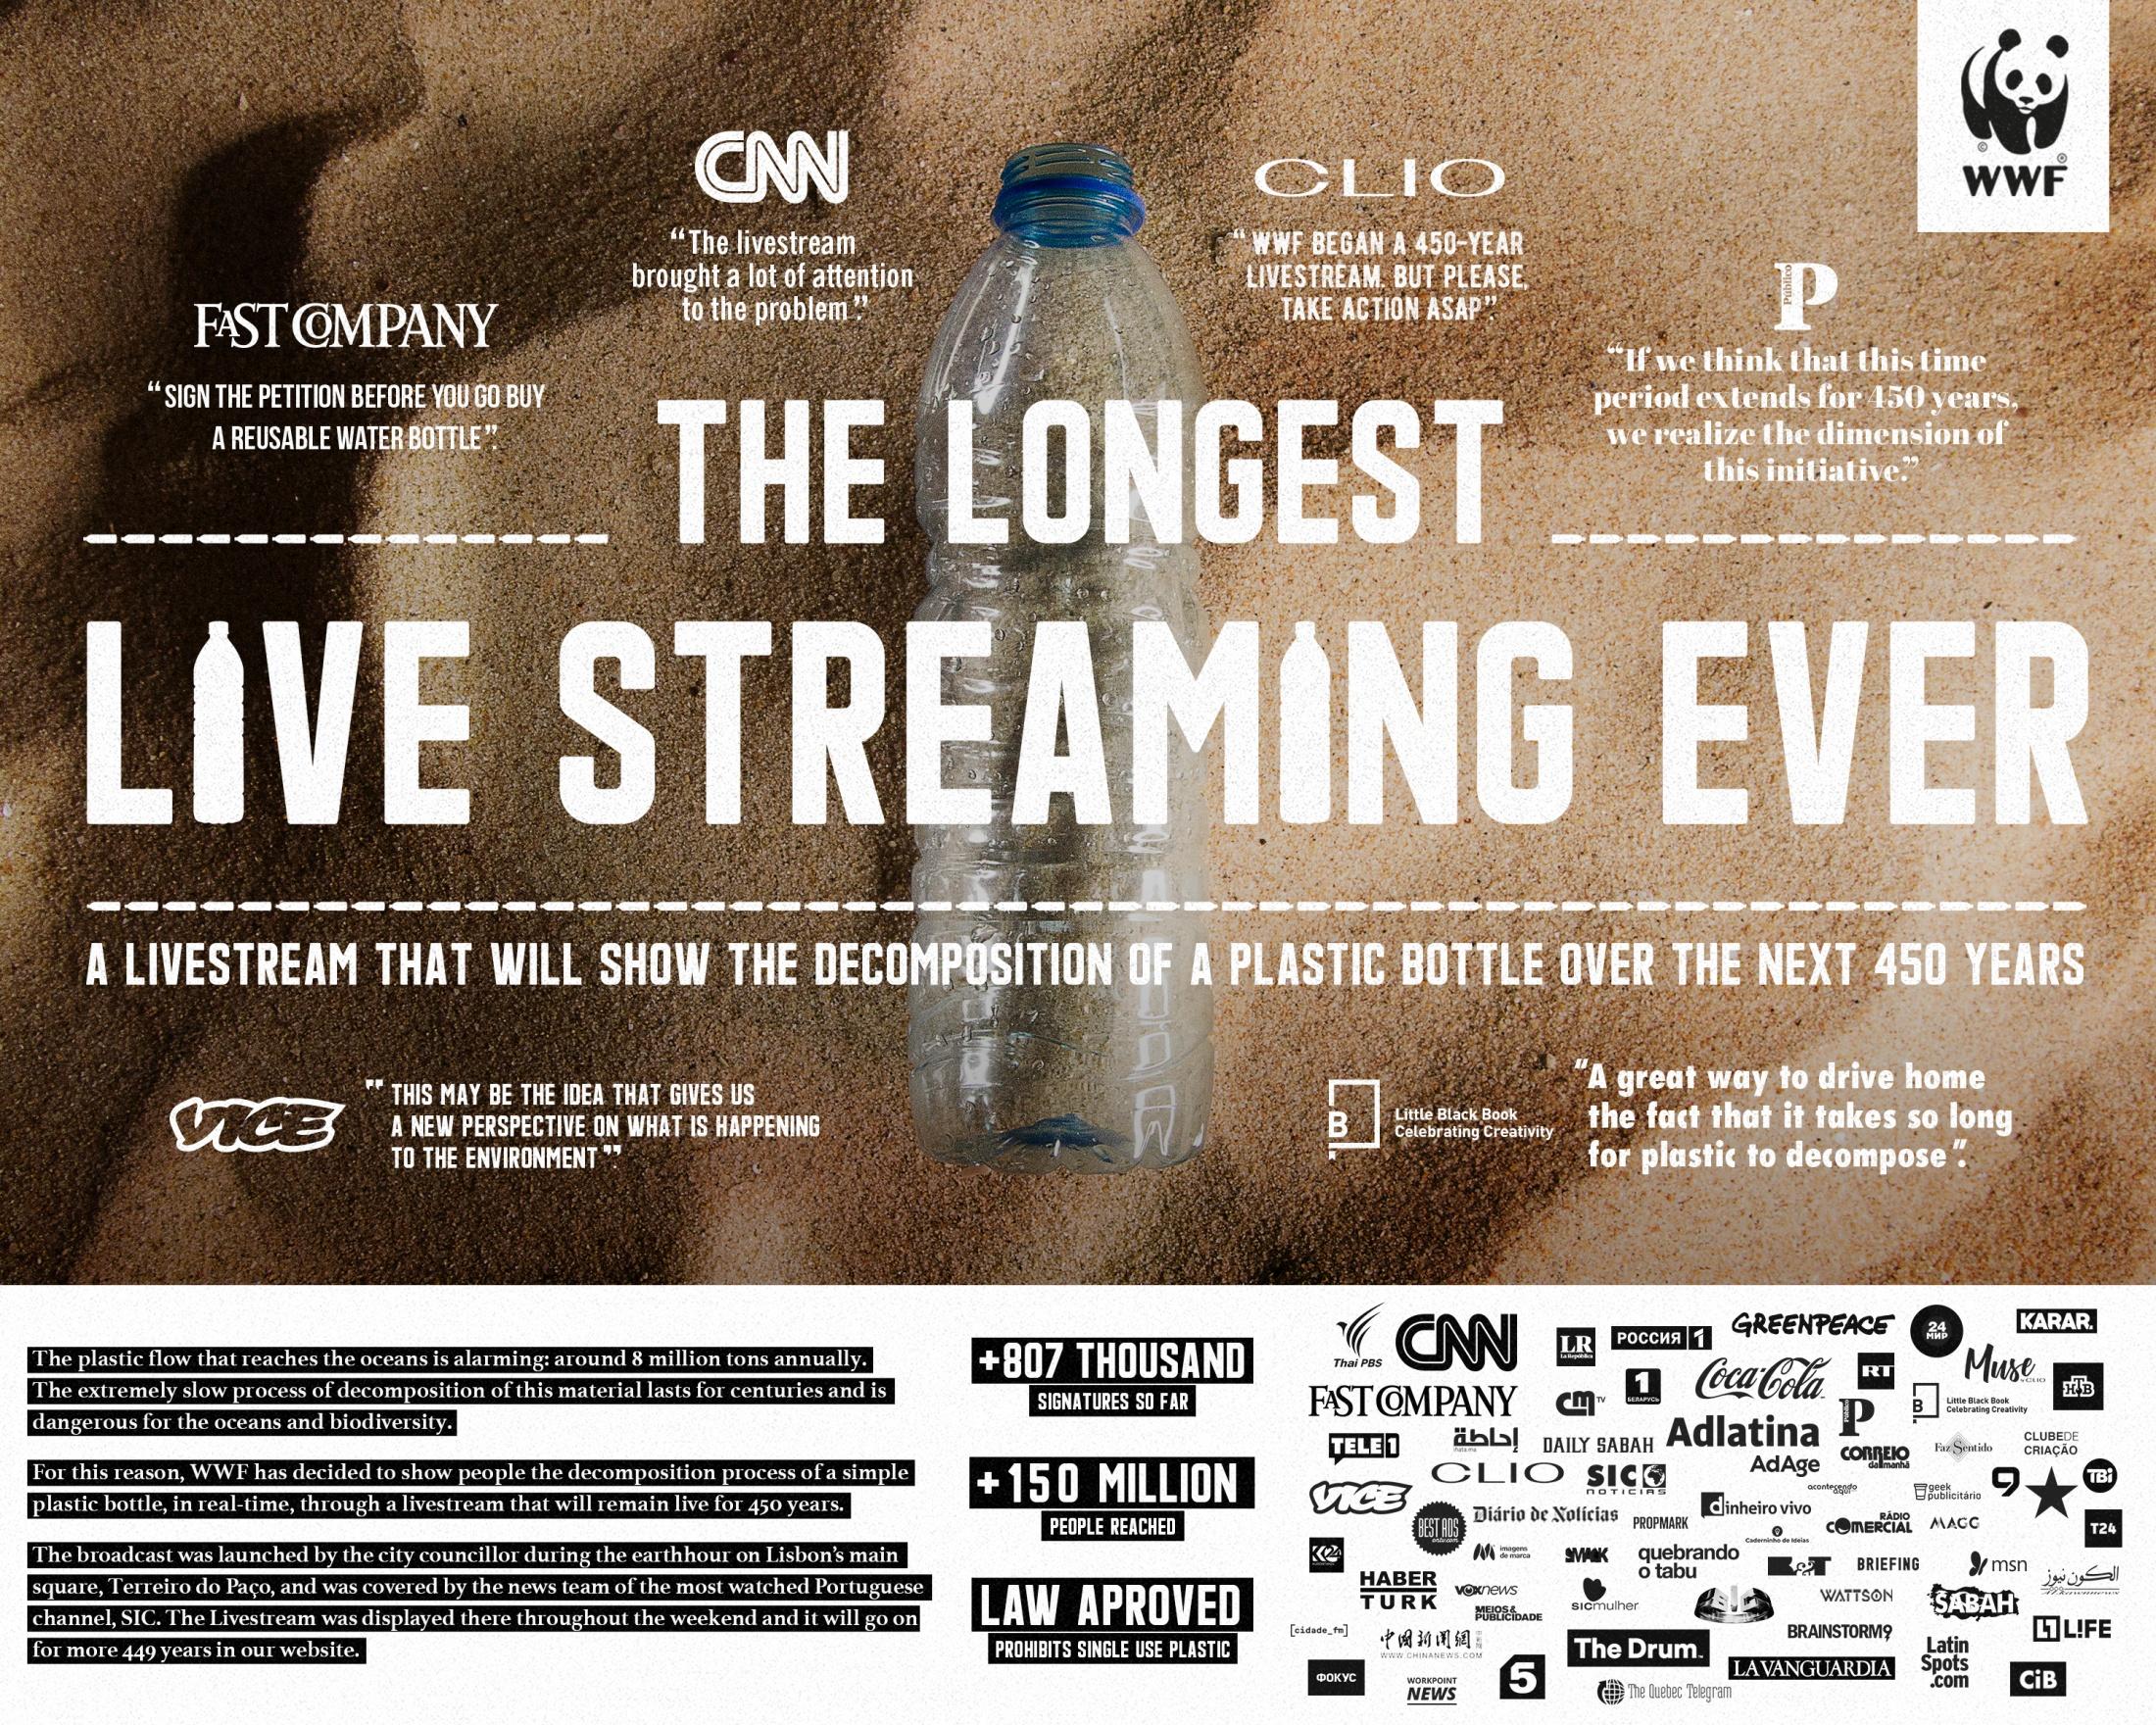 Thumbnail for WWF's 450 Years Lifestream